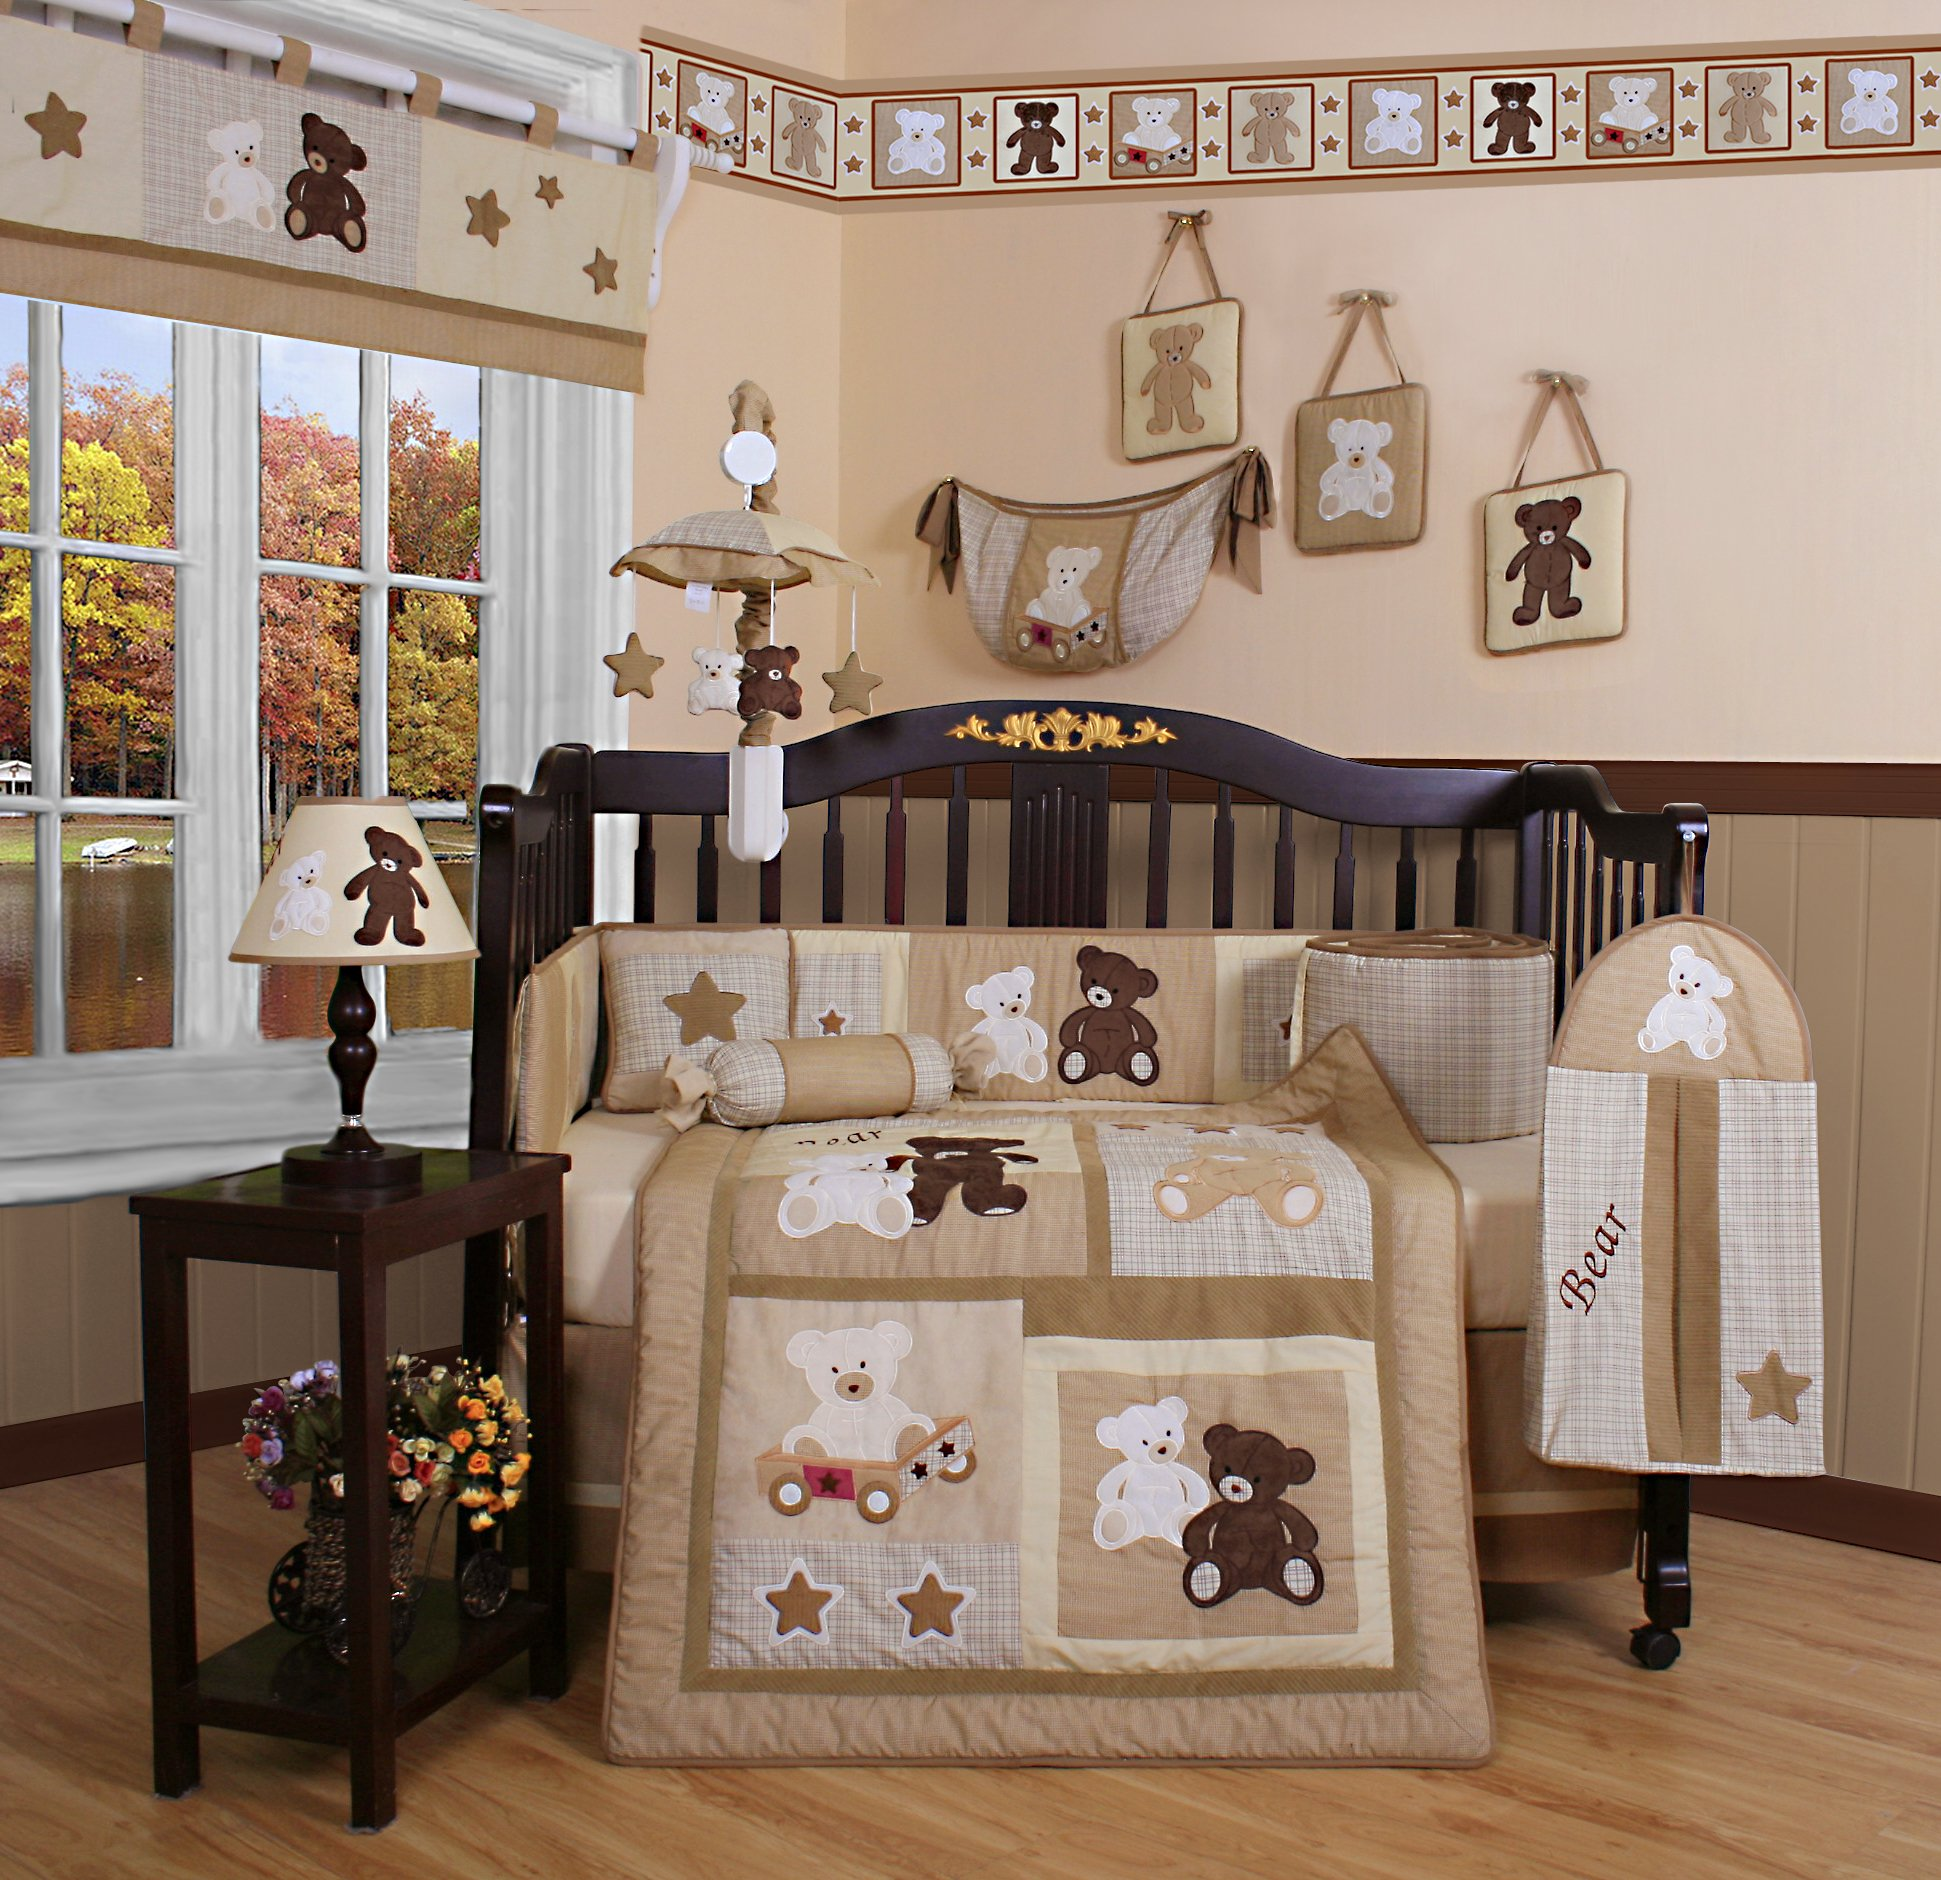 GEENNY Boutique 13 Piece Crib Bedding Set, Baby Teddy Bear by GEENNY